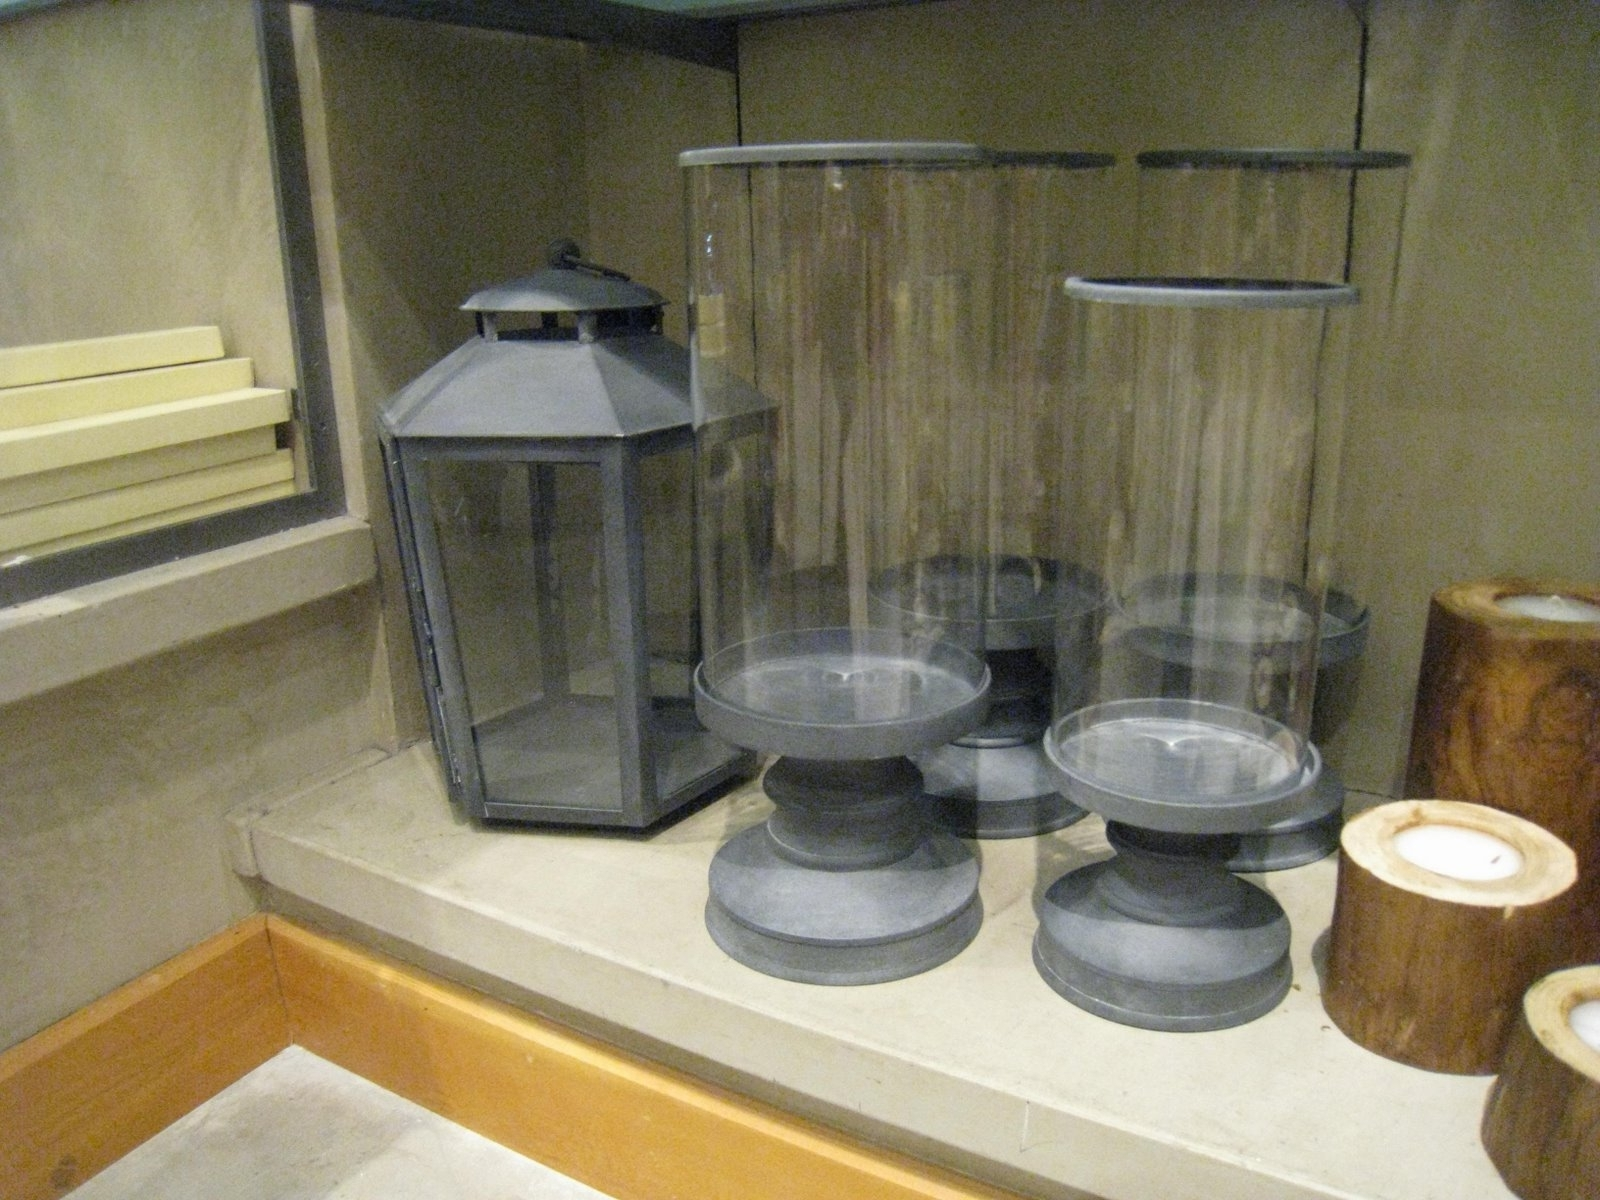 Well Liked Zinc Outdoor Lanterns With Regard To Weathered Zinc Garden Lanterns : Katy Elliott (View 13 of 20)